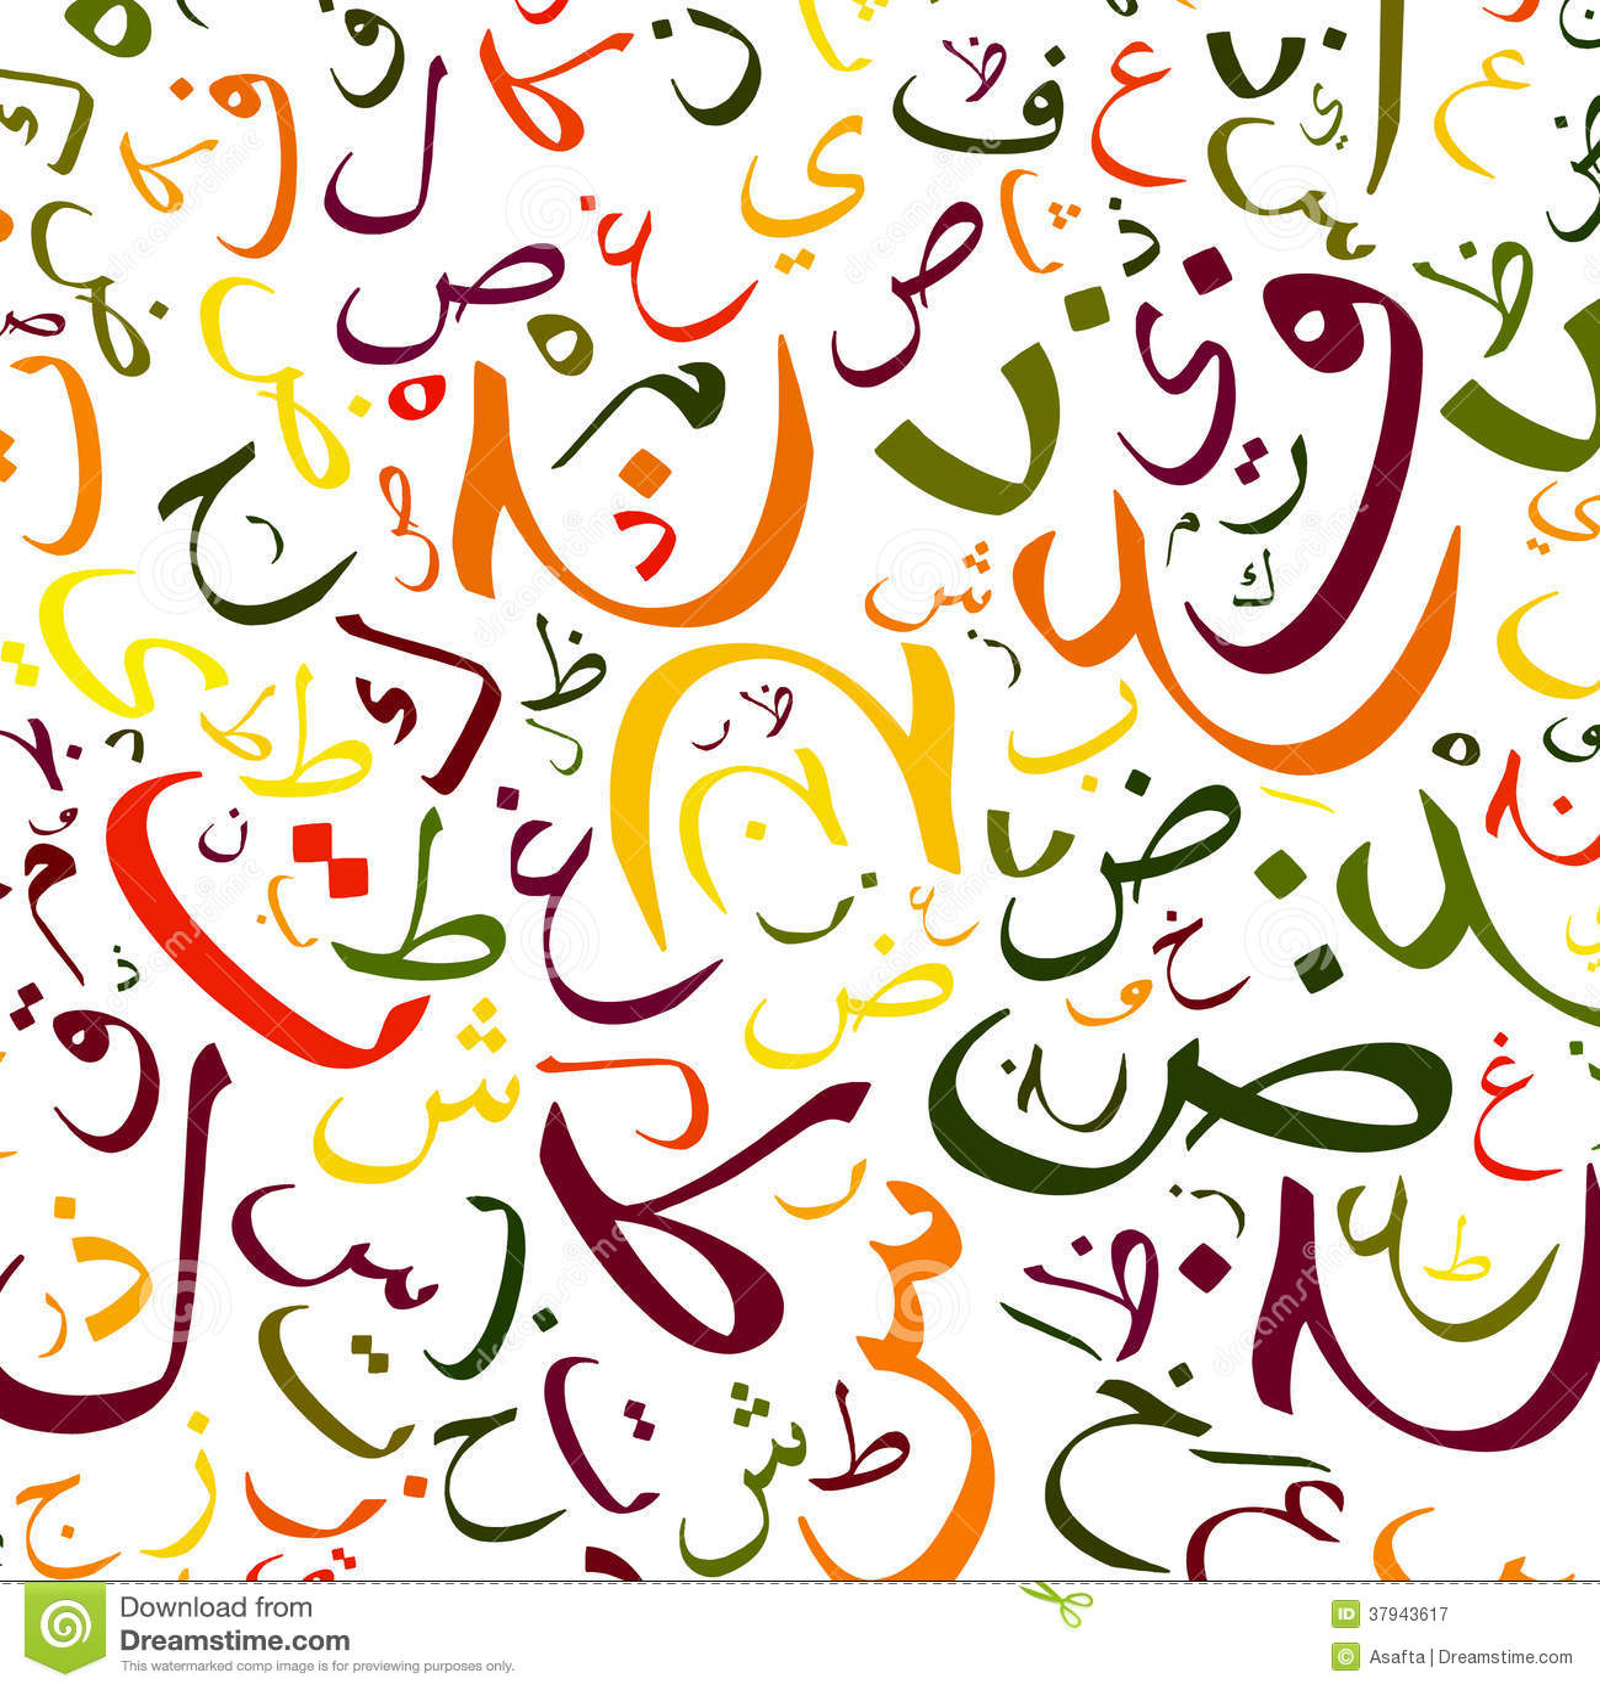 Arabic Writing Practice